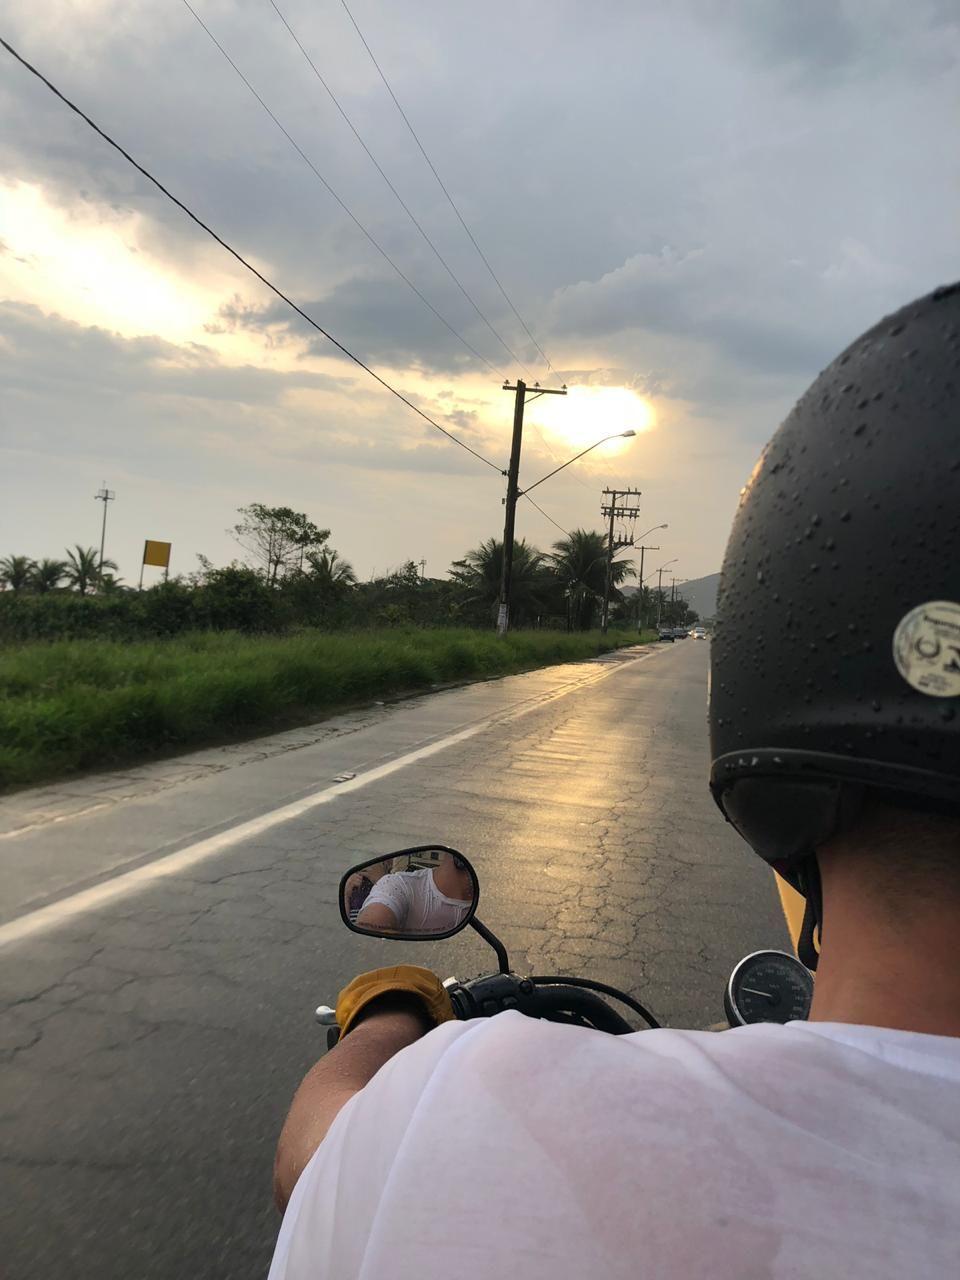 Moto tempestade jpeg